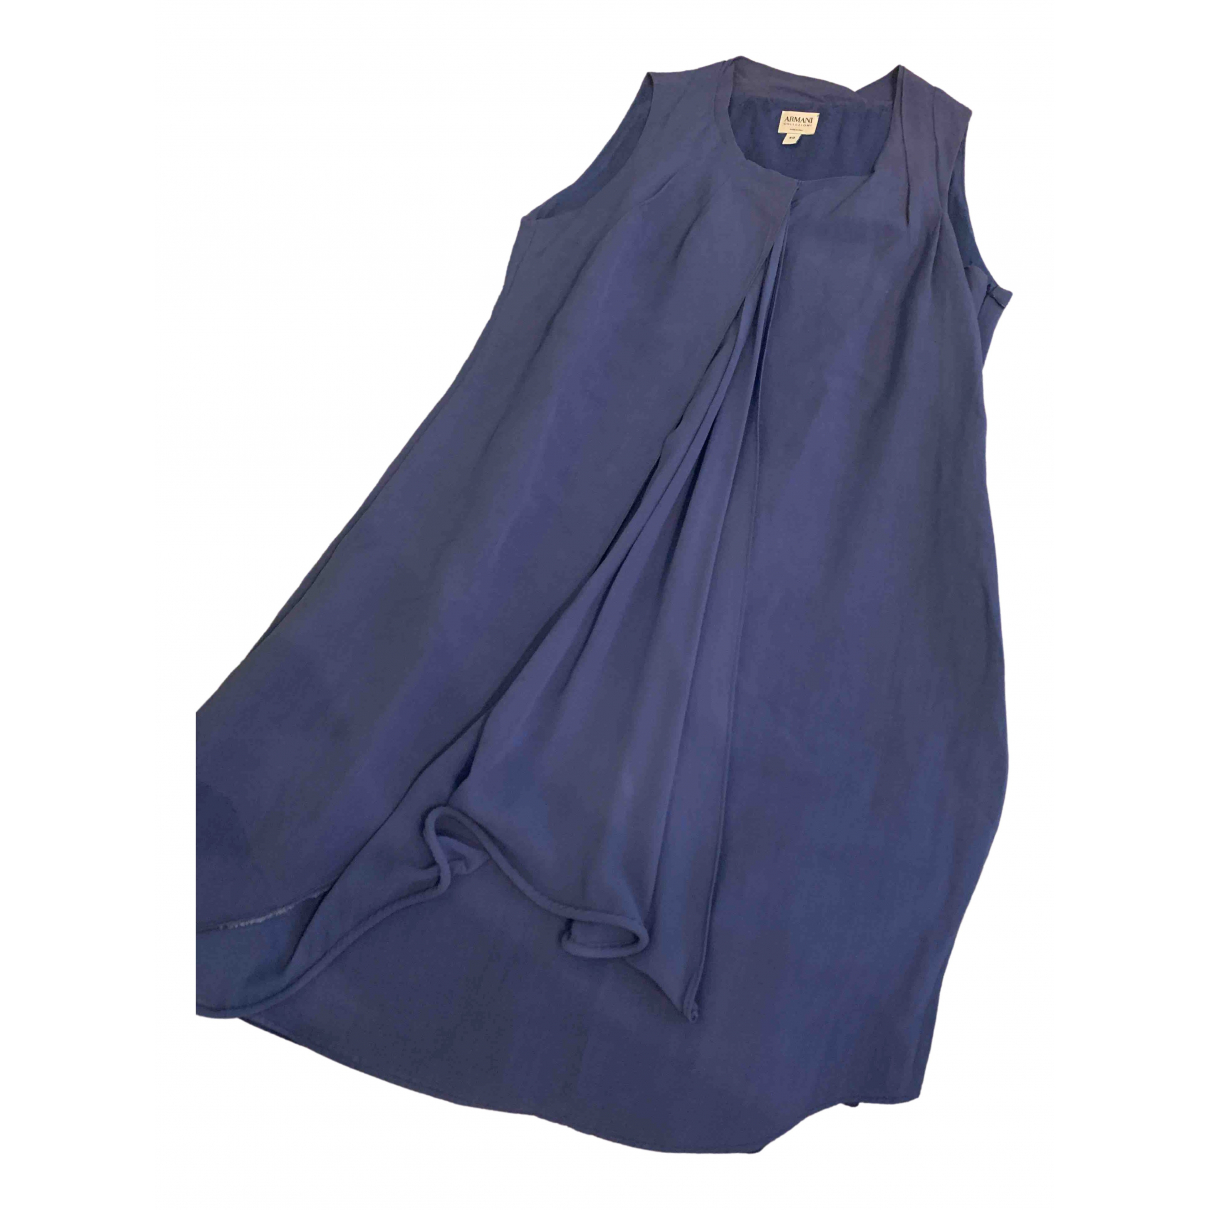 Armani Collezioni \N Blue Linen dress for Women 40 IT